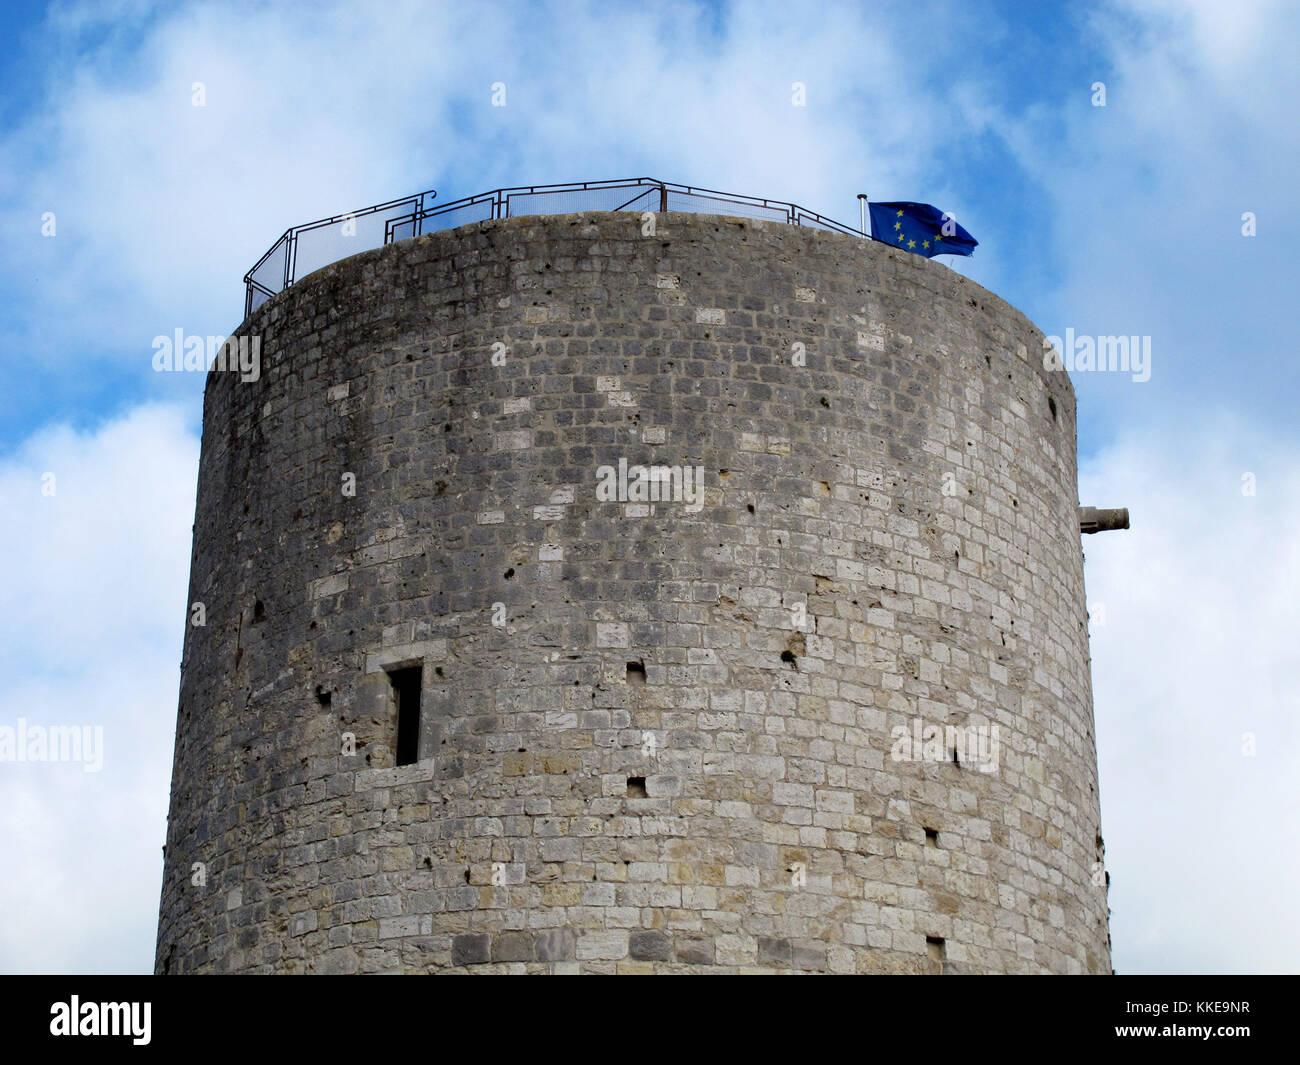 Dungeon of the Castle of Dourdan, Essonne, Ile-de-France, France, Europe Stock Photo